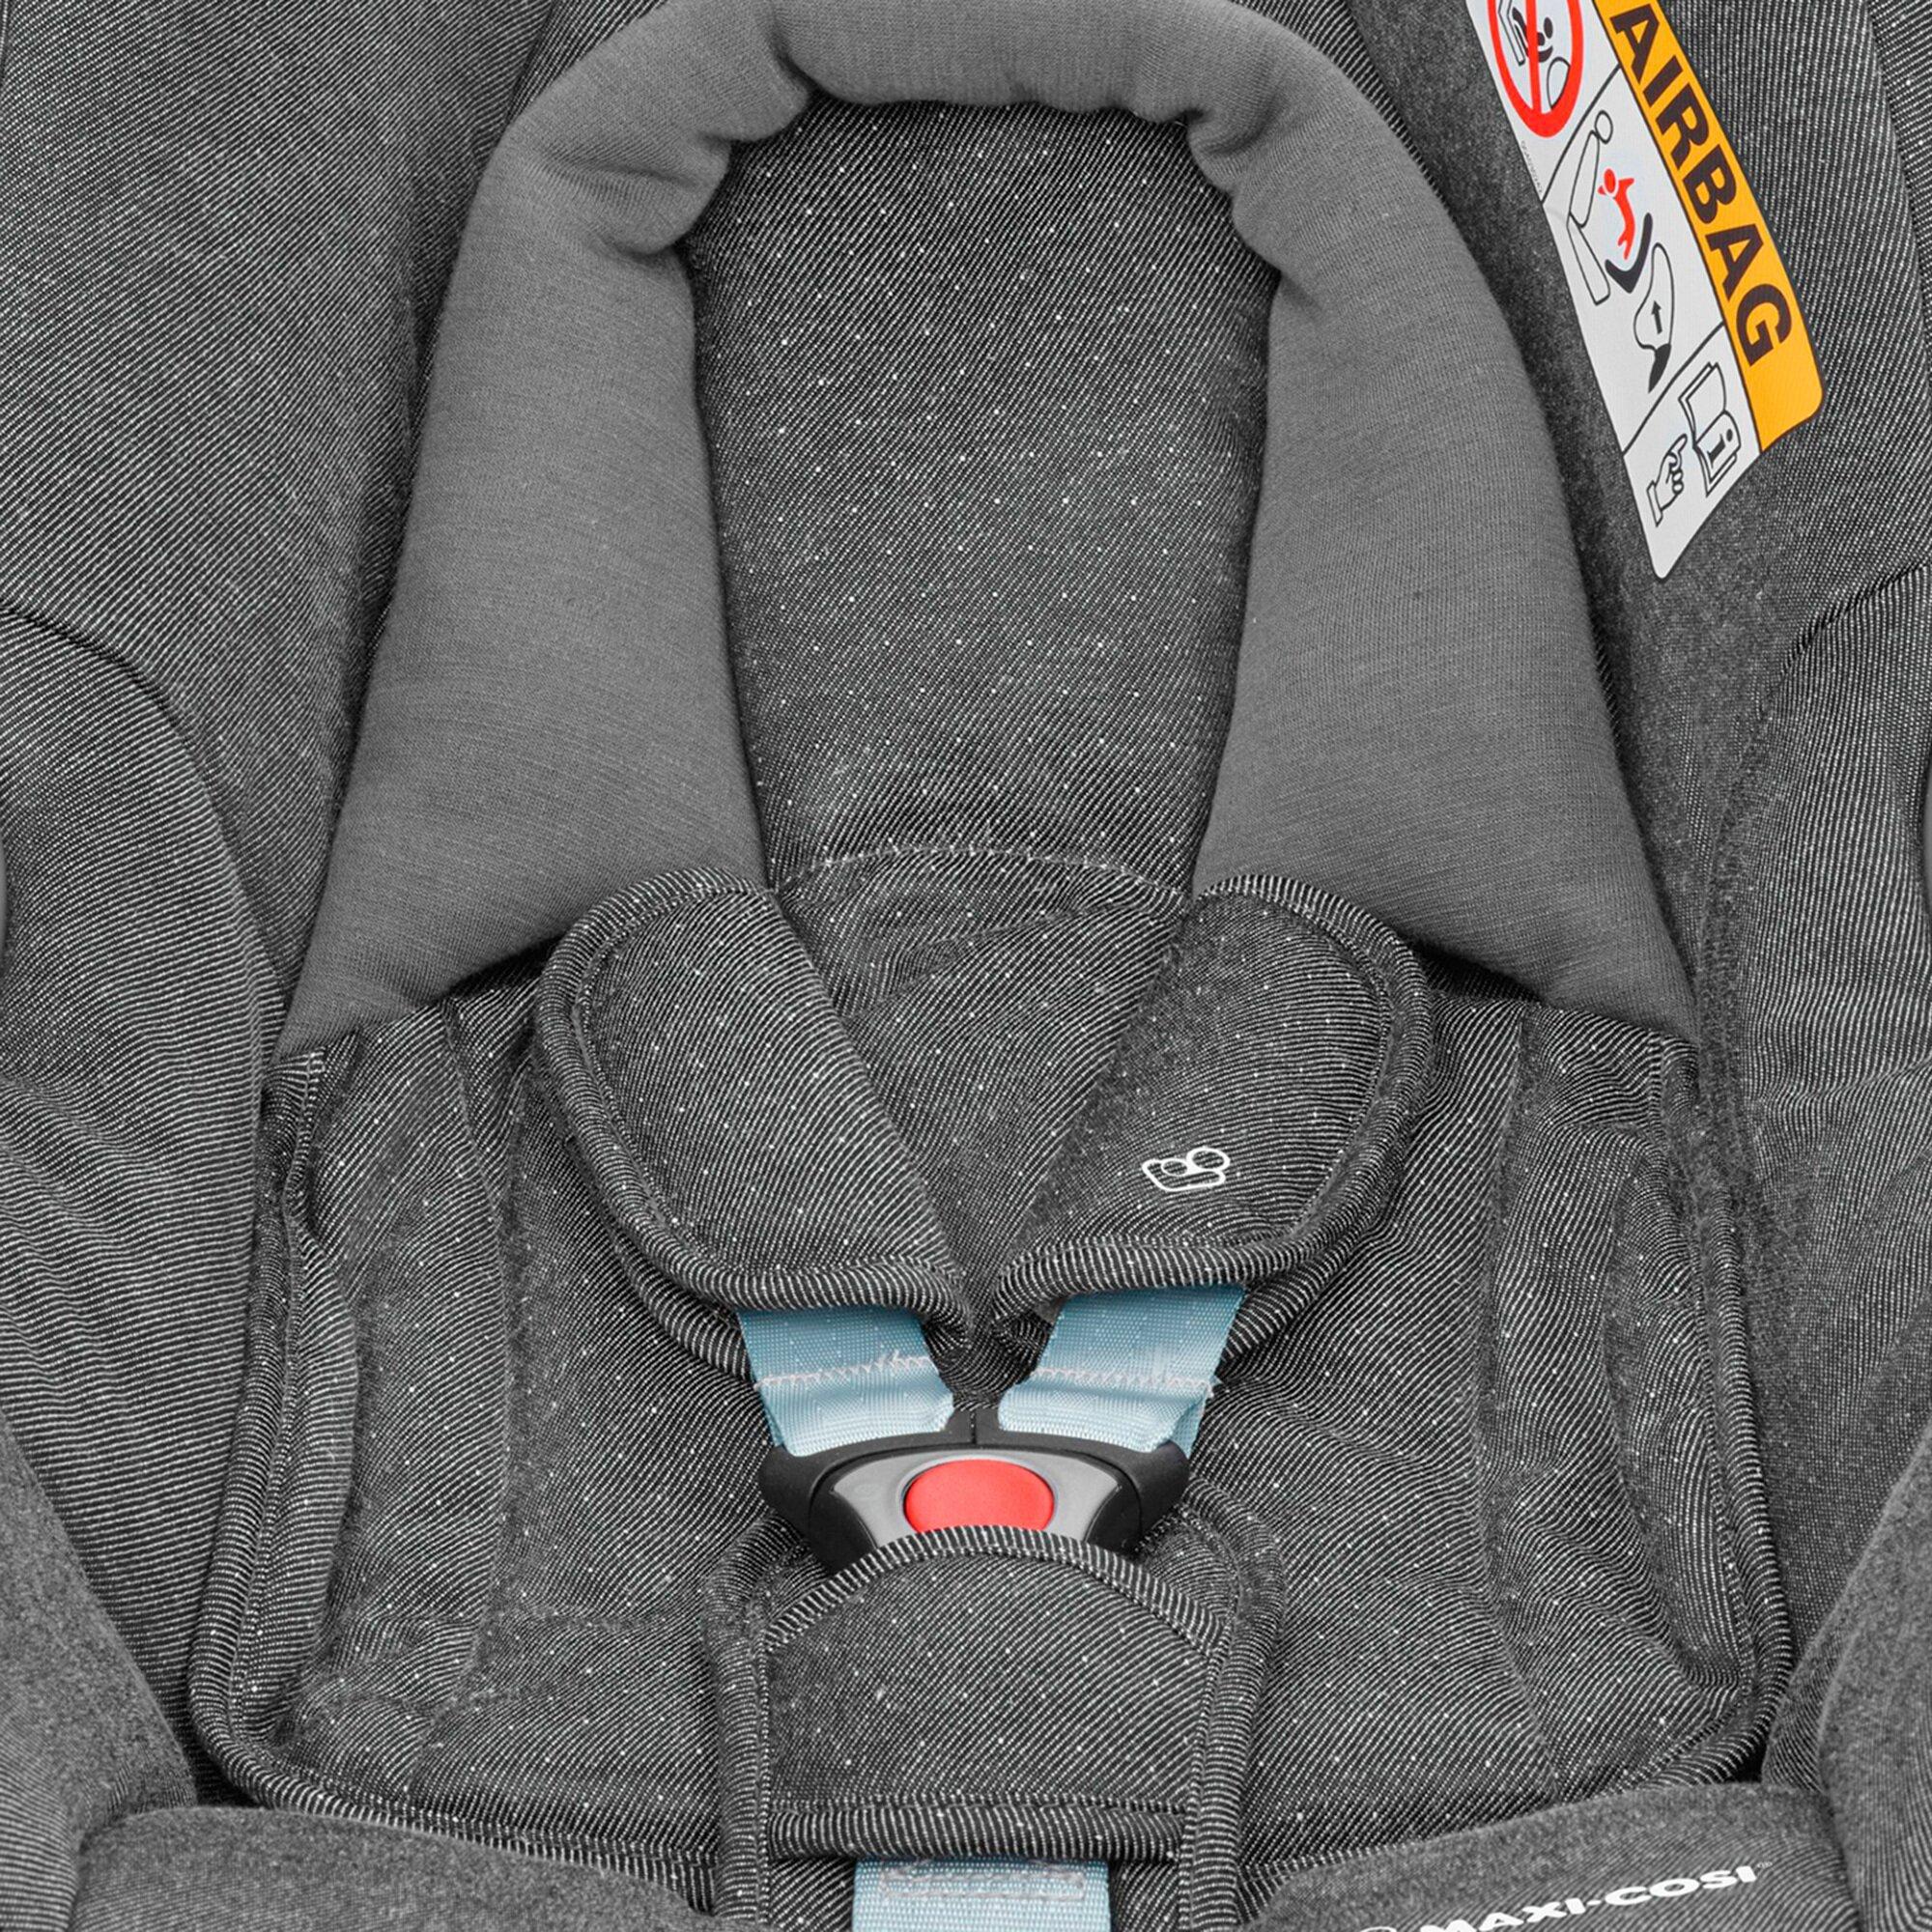 maxi-cosi-babyschale-design-2018-grau